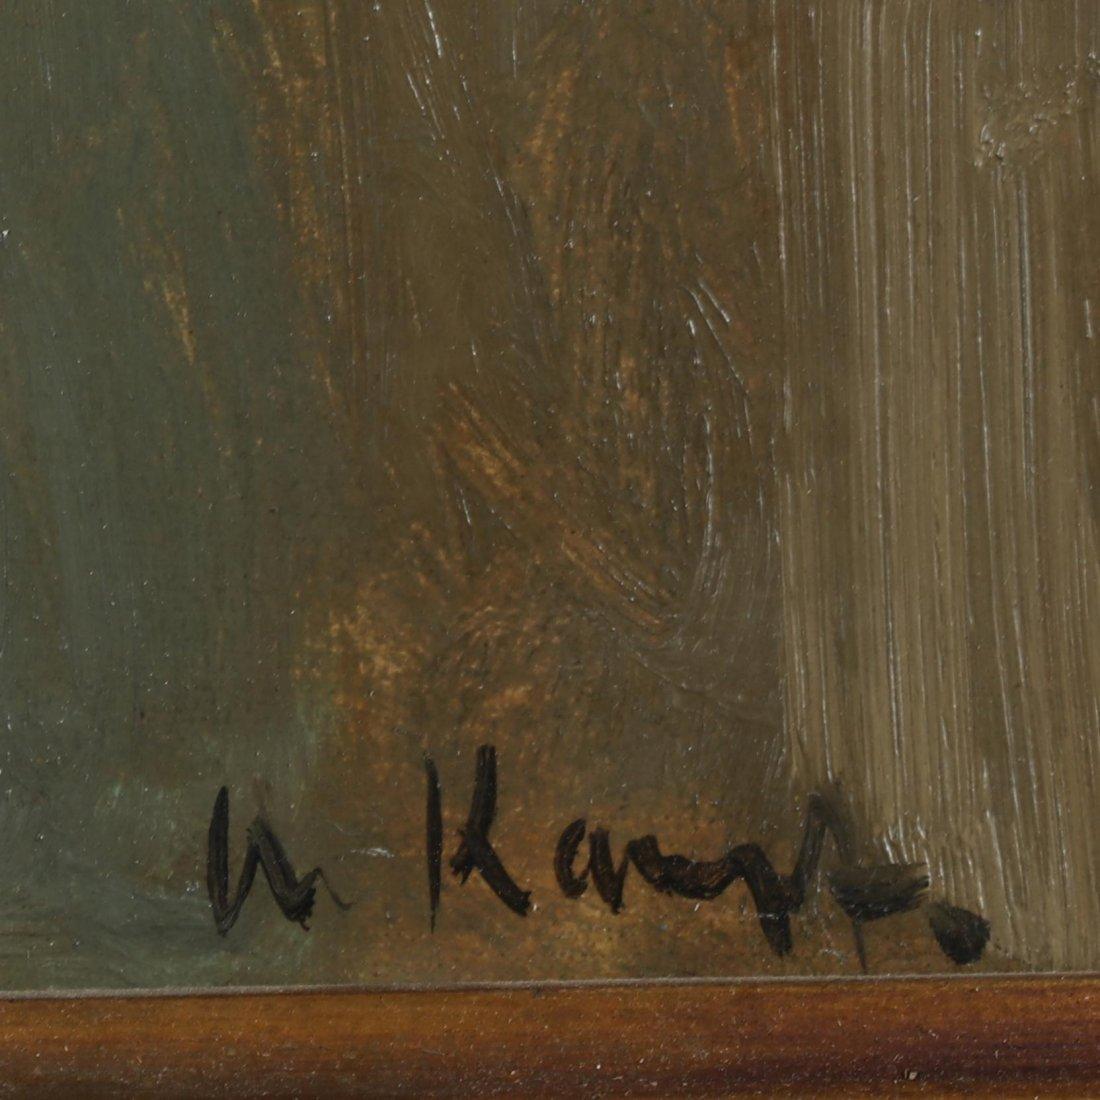 Arthur Kampf (German, 1864-1950), A Portrait of - 2